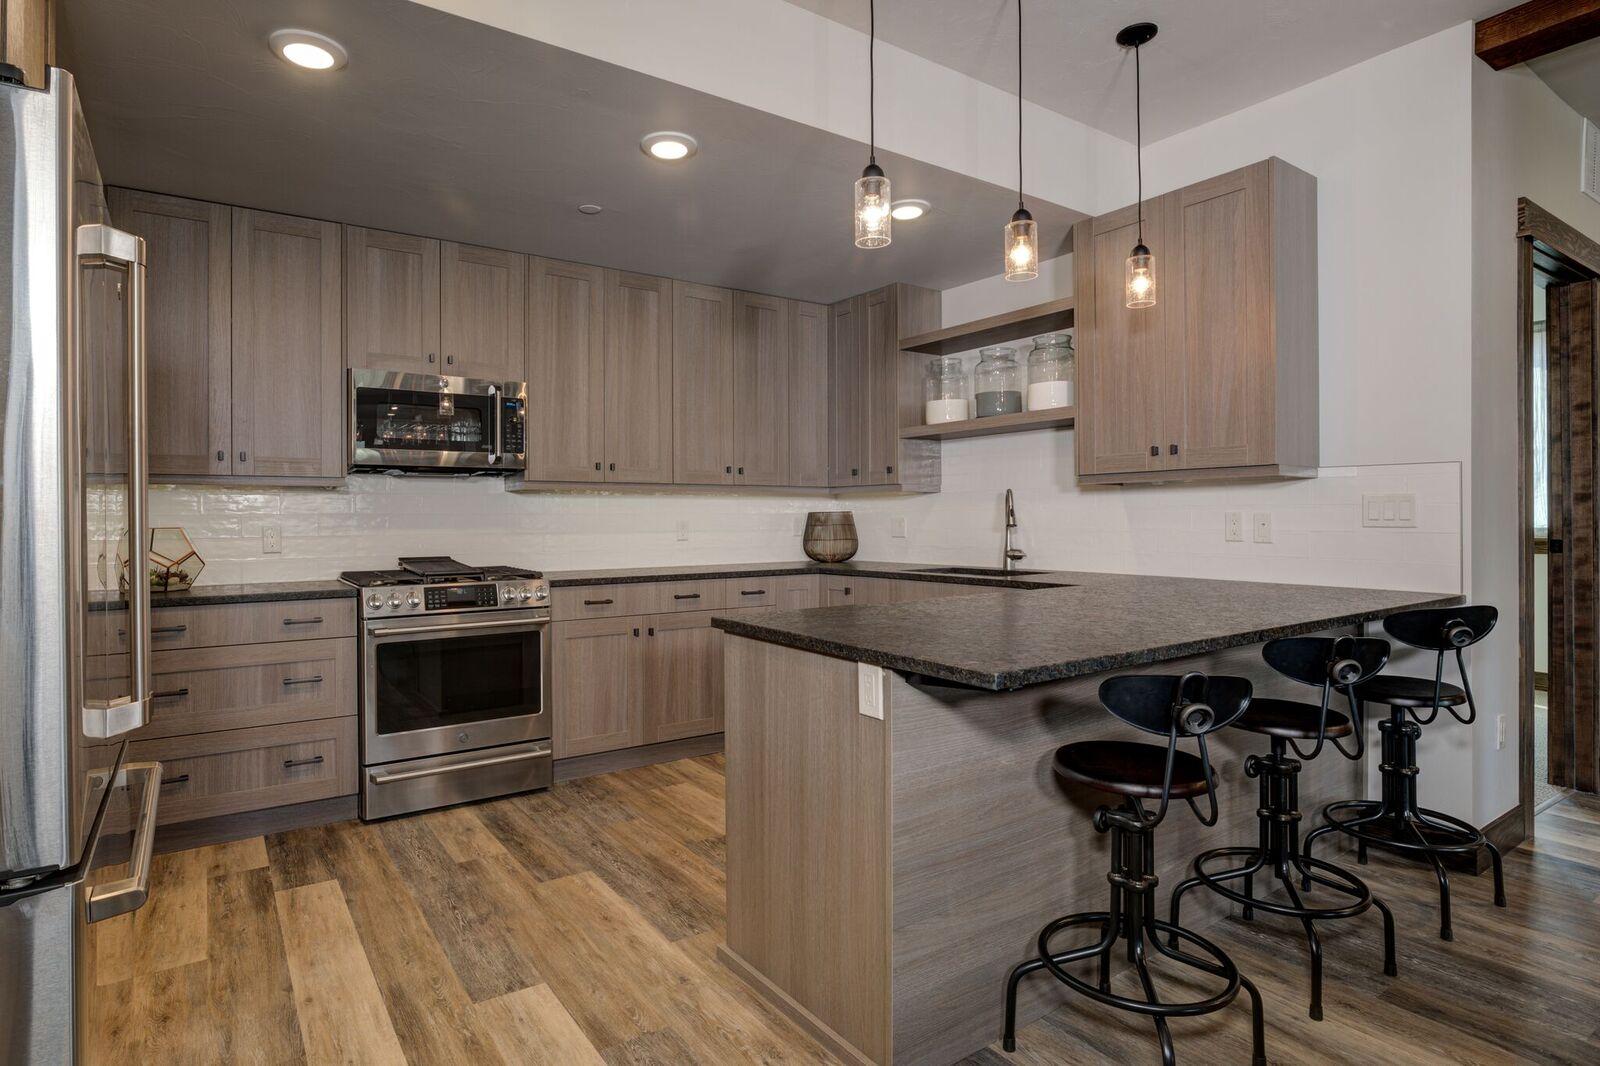 102 Kitchen 4.jpeg